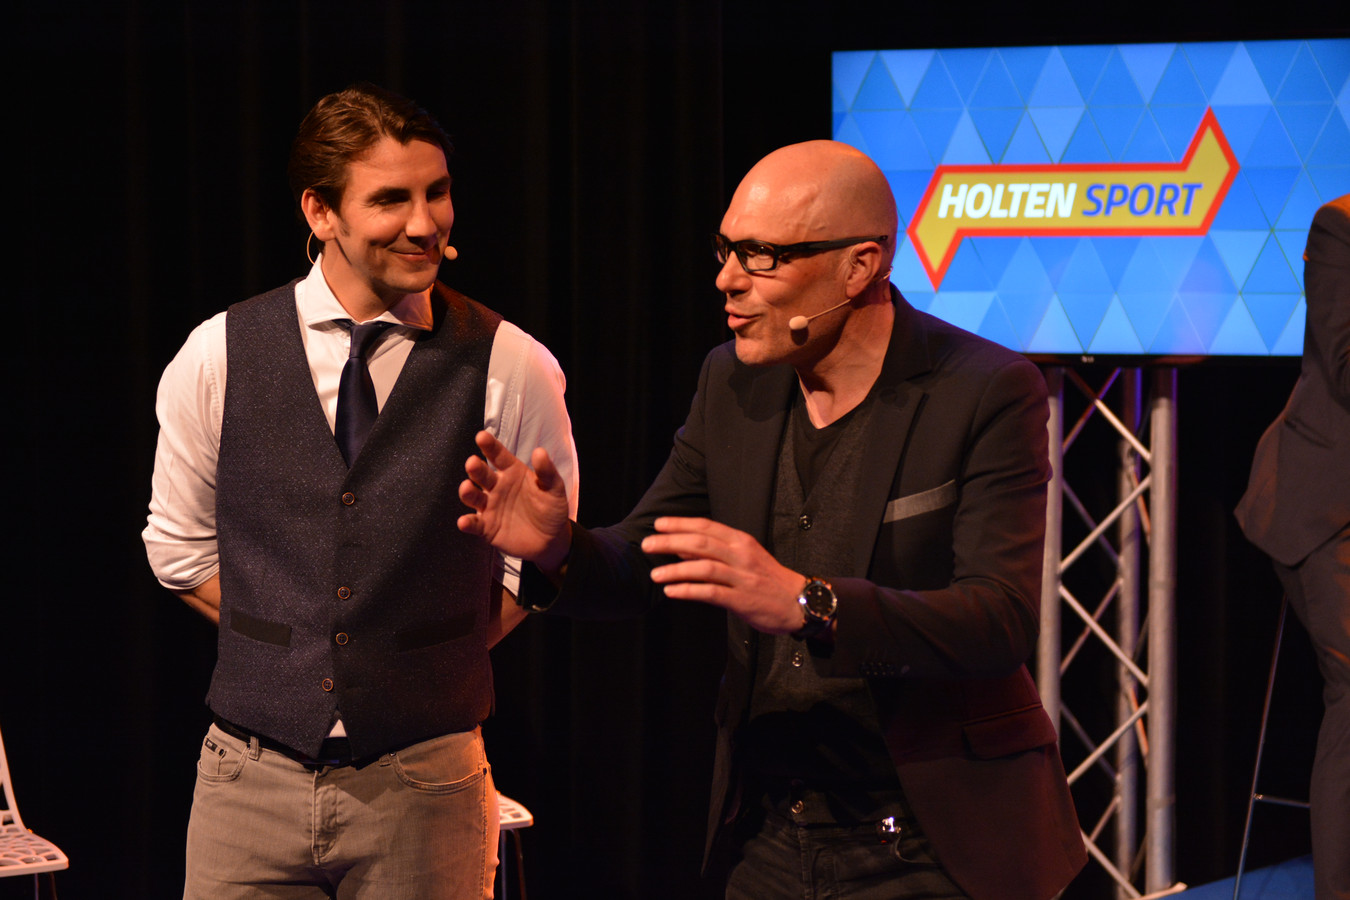 Oud-wielrenner, positivo en spreker Gert Jakobs (rechts) in het theater in Holten.